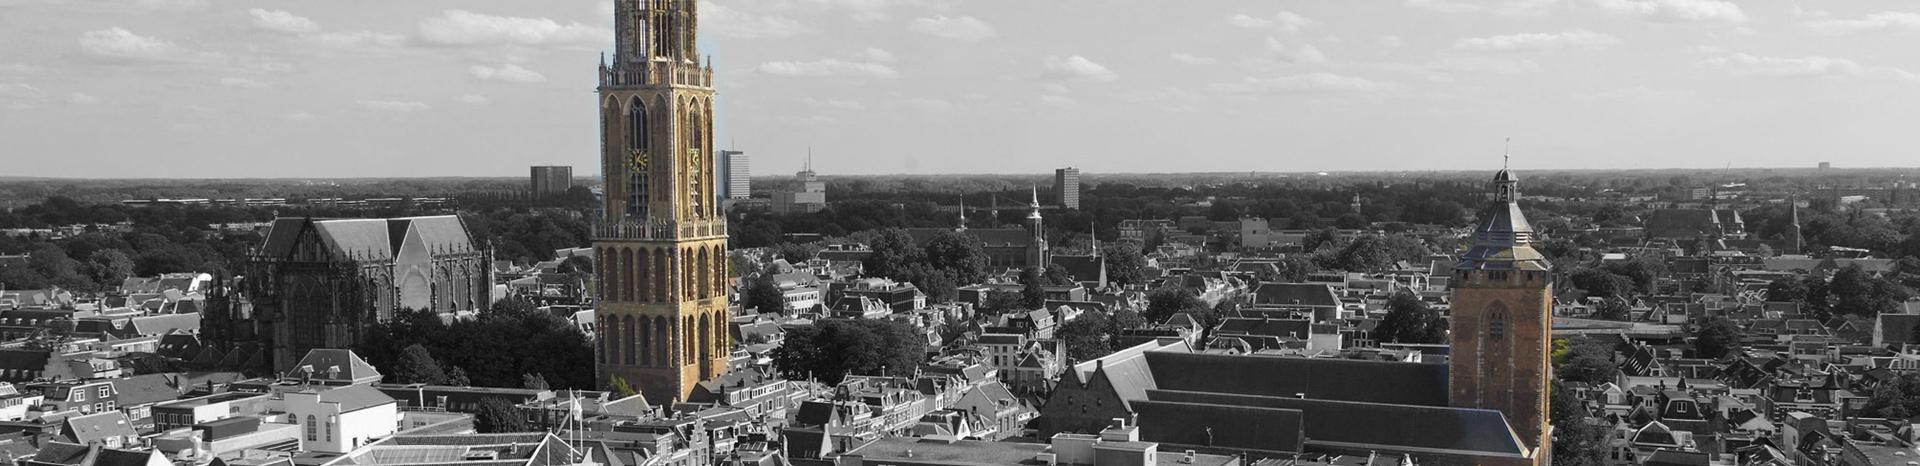 Letselschade advocaat Utrecht | LetselPro